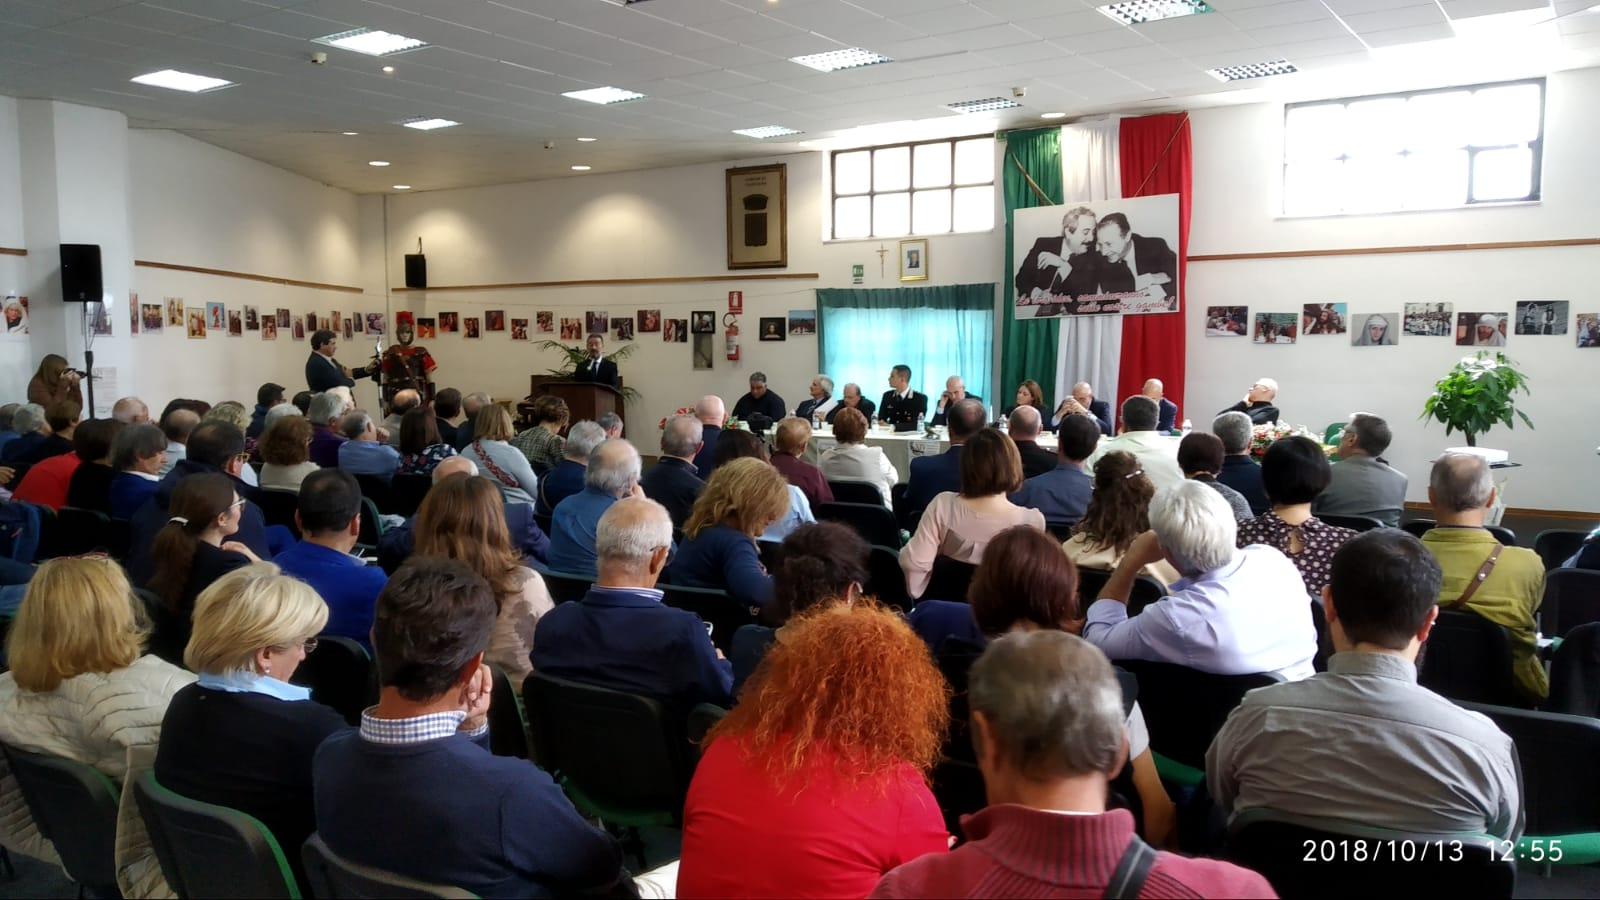 13 Ottobre 2018, Cianciana - XIV Assemblea Nazionale di Europassione per l